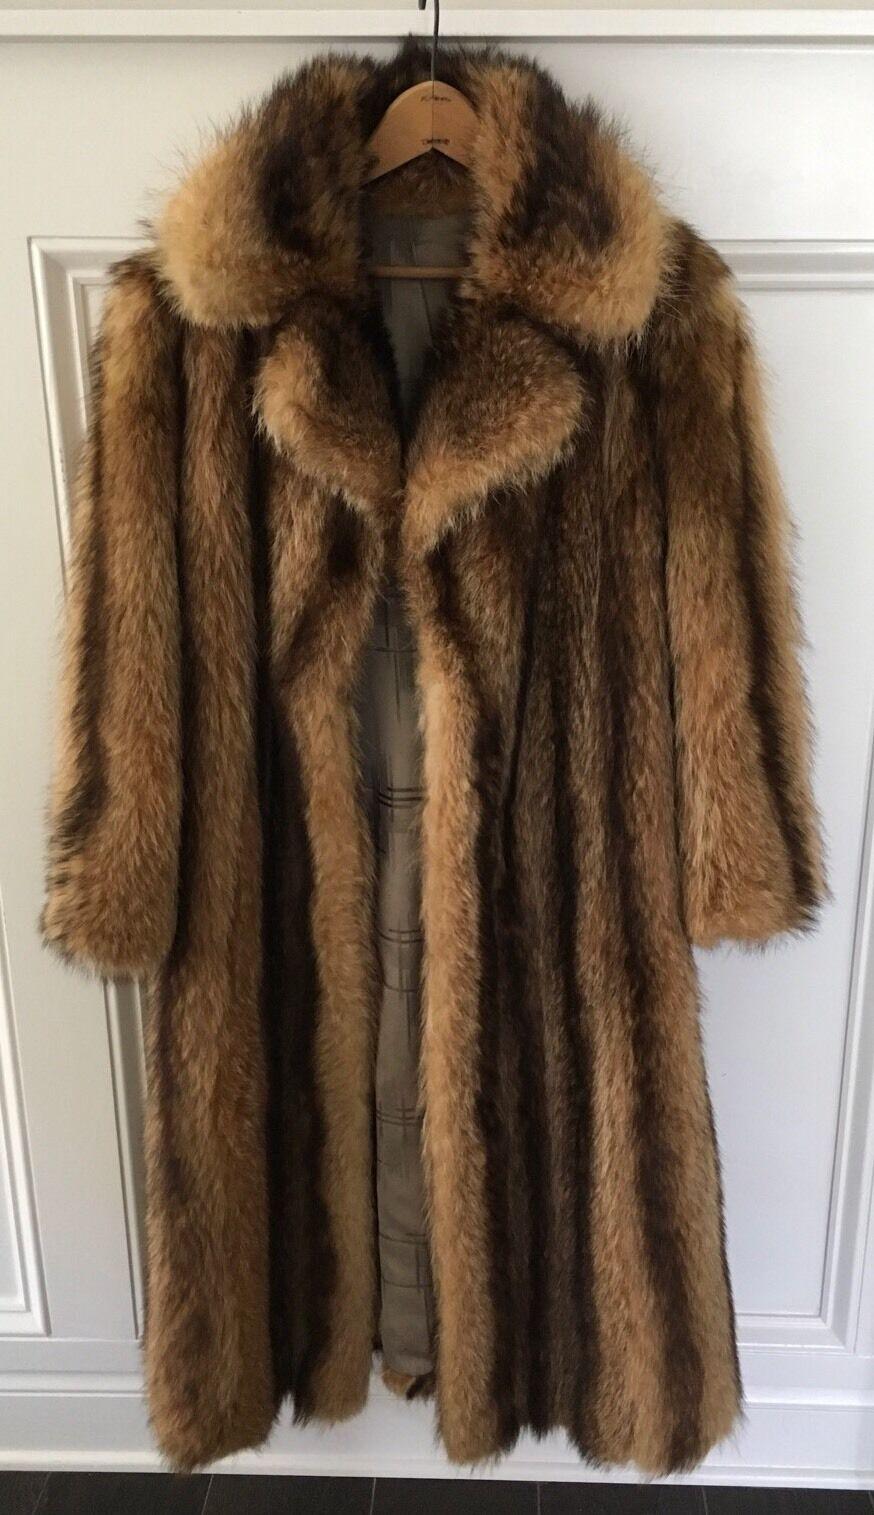 Äkta TANUKI Natural Raccoon bspringaa, gulden Fur Mid -längd Coat; SZ Liten (4 -8)